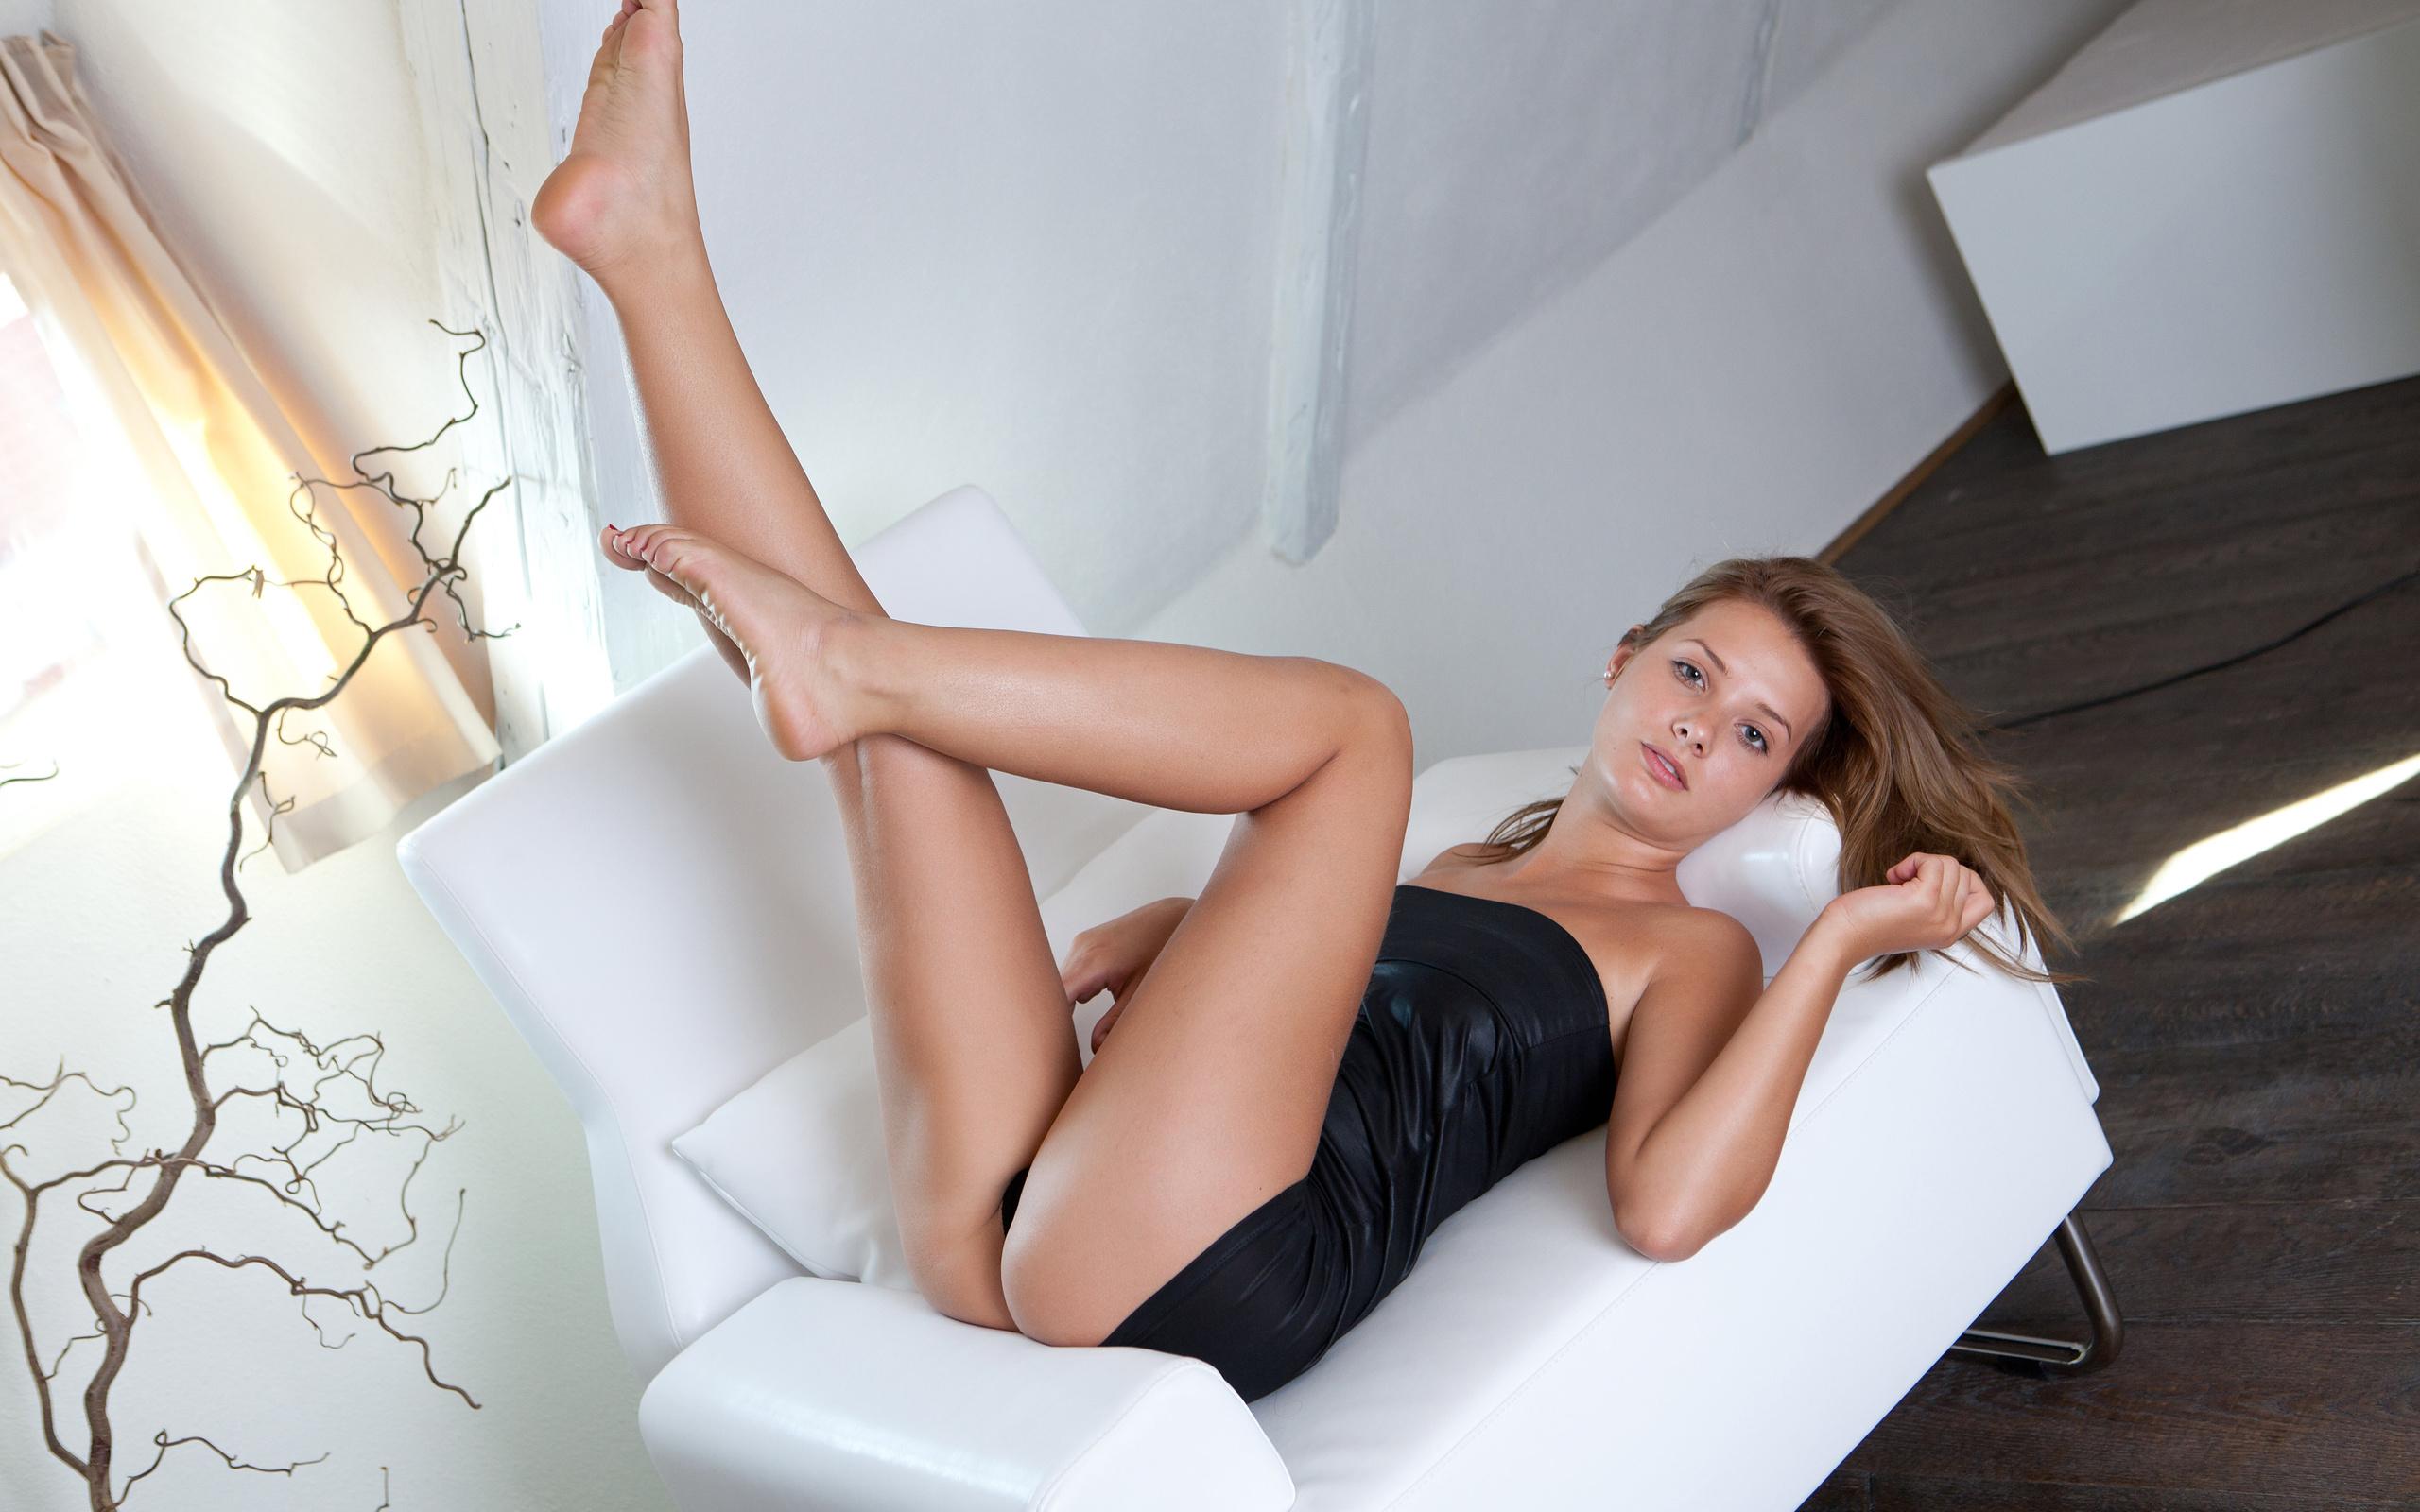 Широко раздвинула ноги и показала киску фото